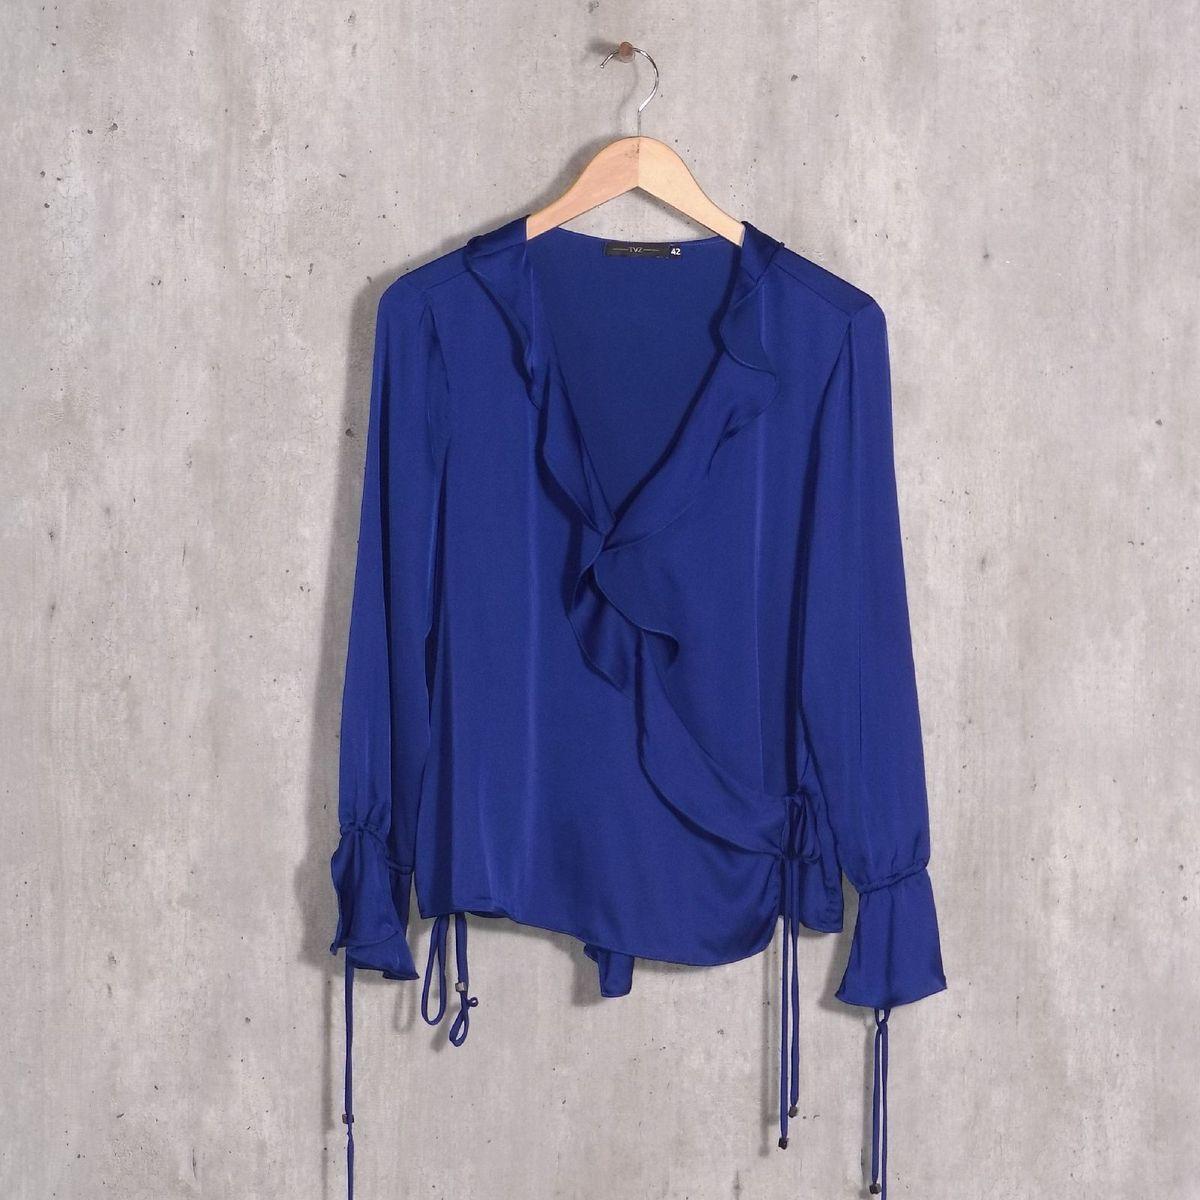 005a32fbd8 Blusa Azul Royal Cetim Tvz